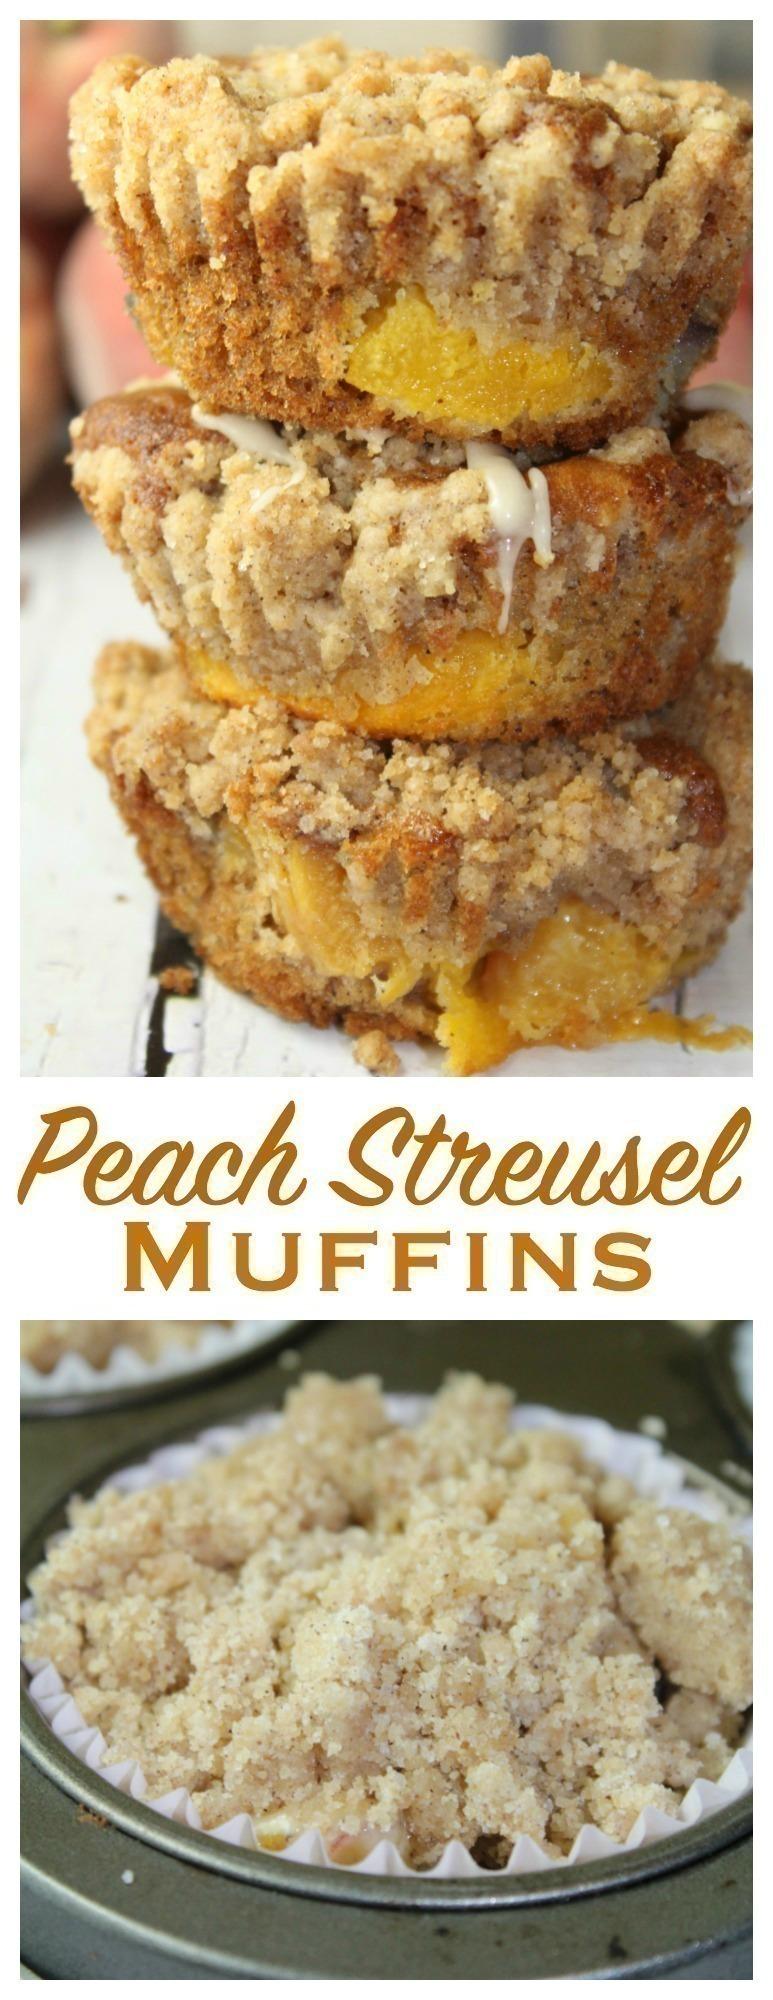 Peach Streusel Muffins